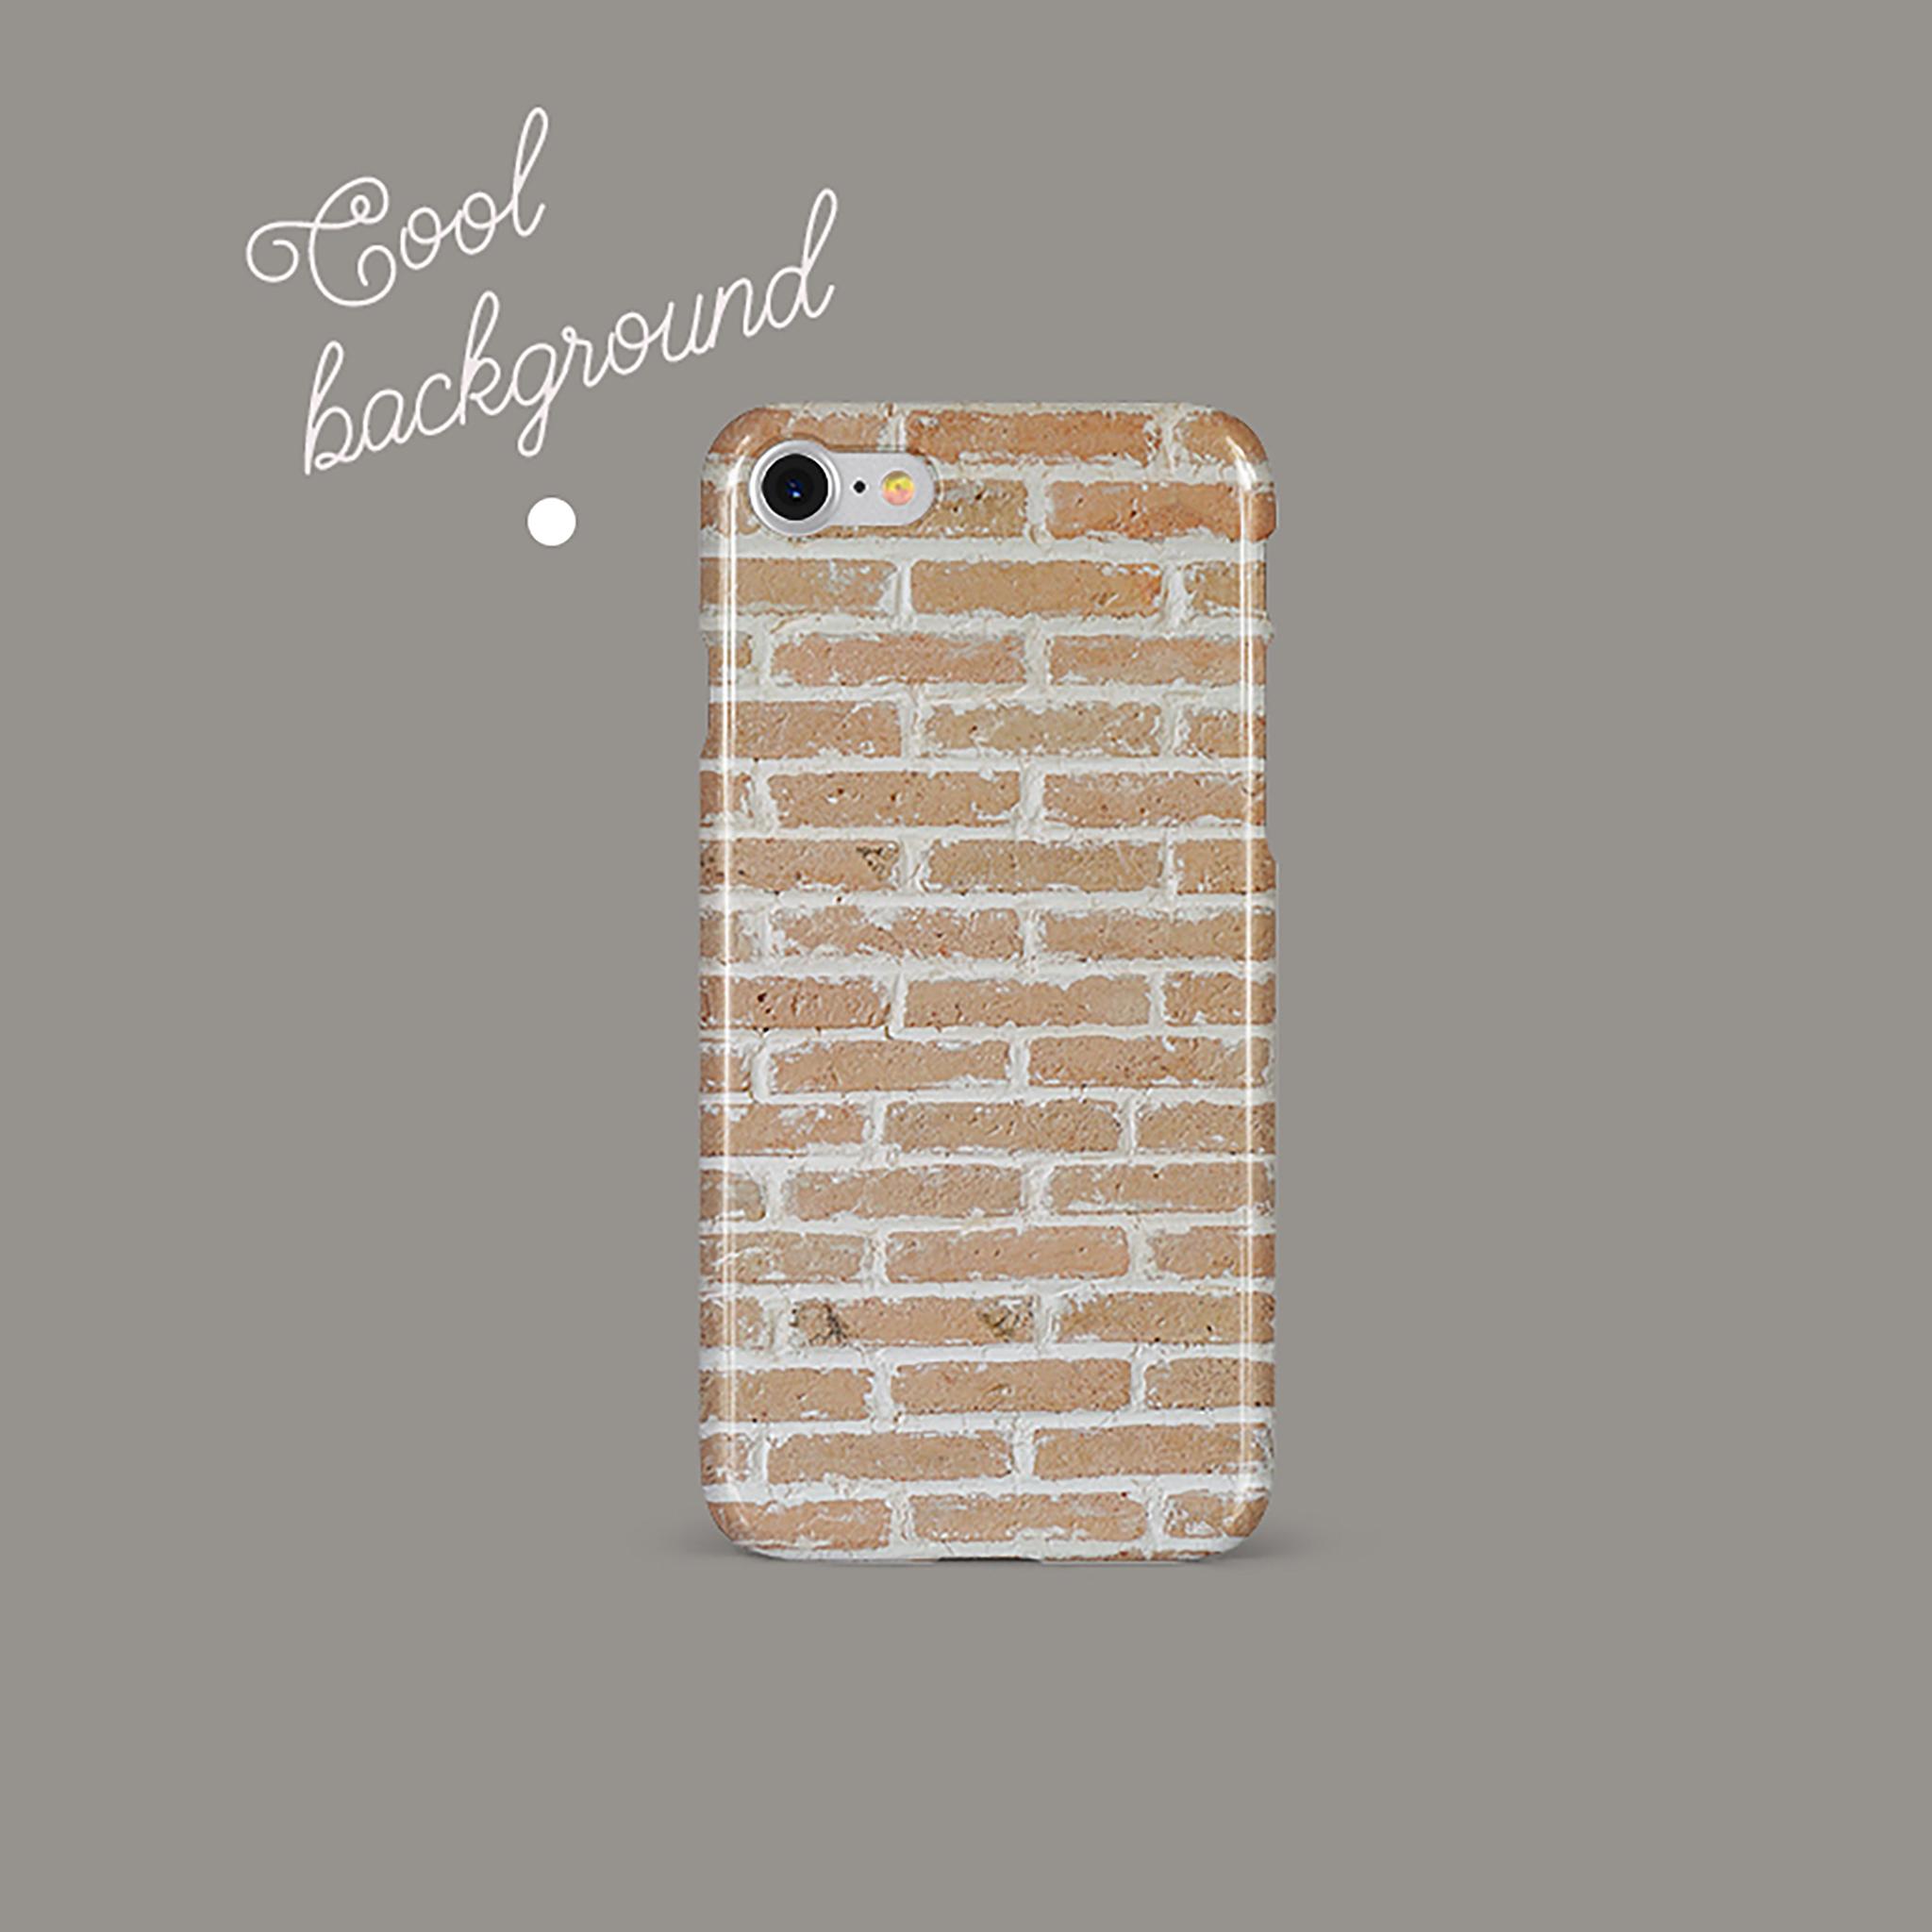 8 Brick Wall Texture Selected - edit example image 6